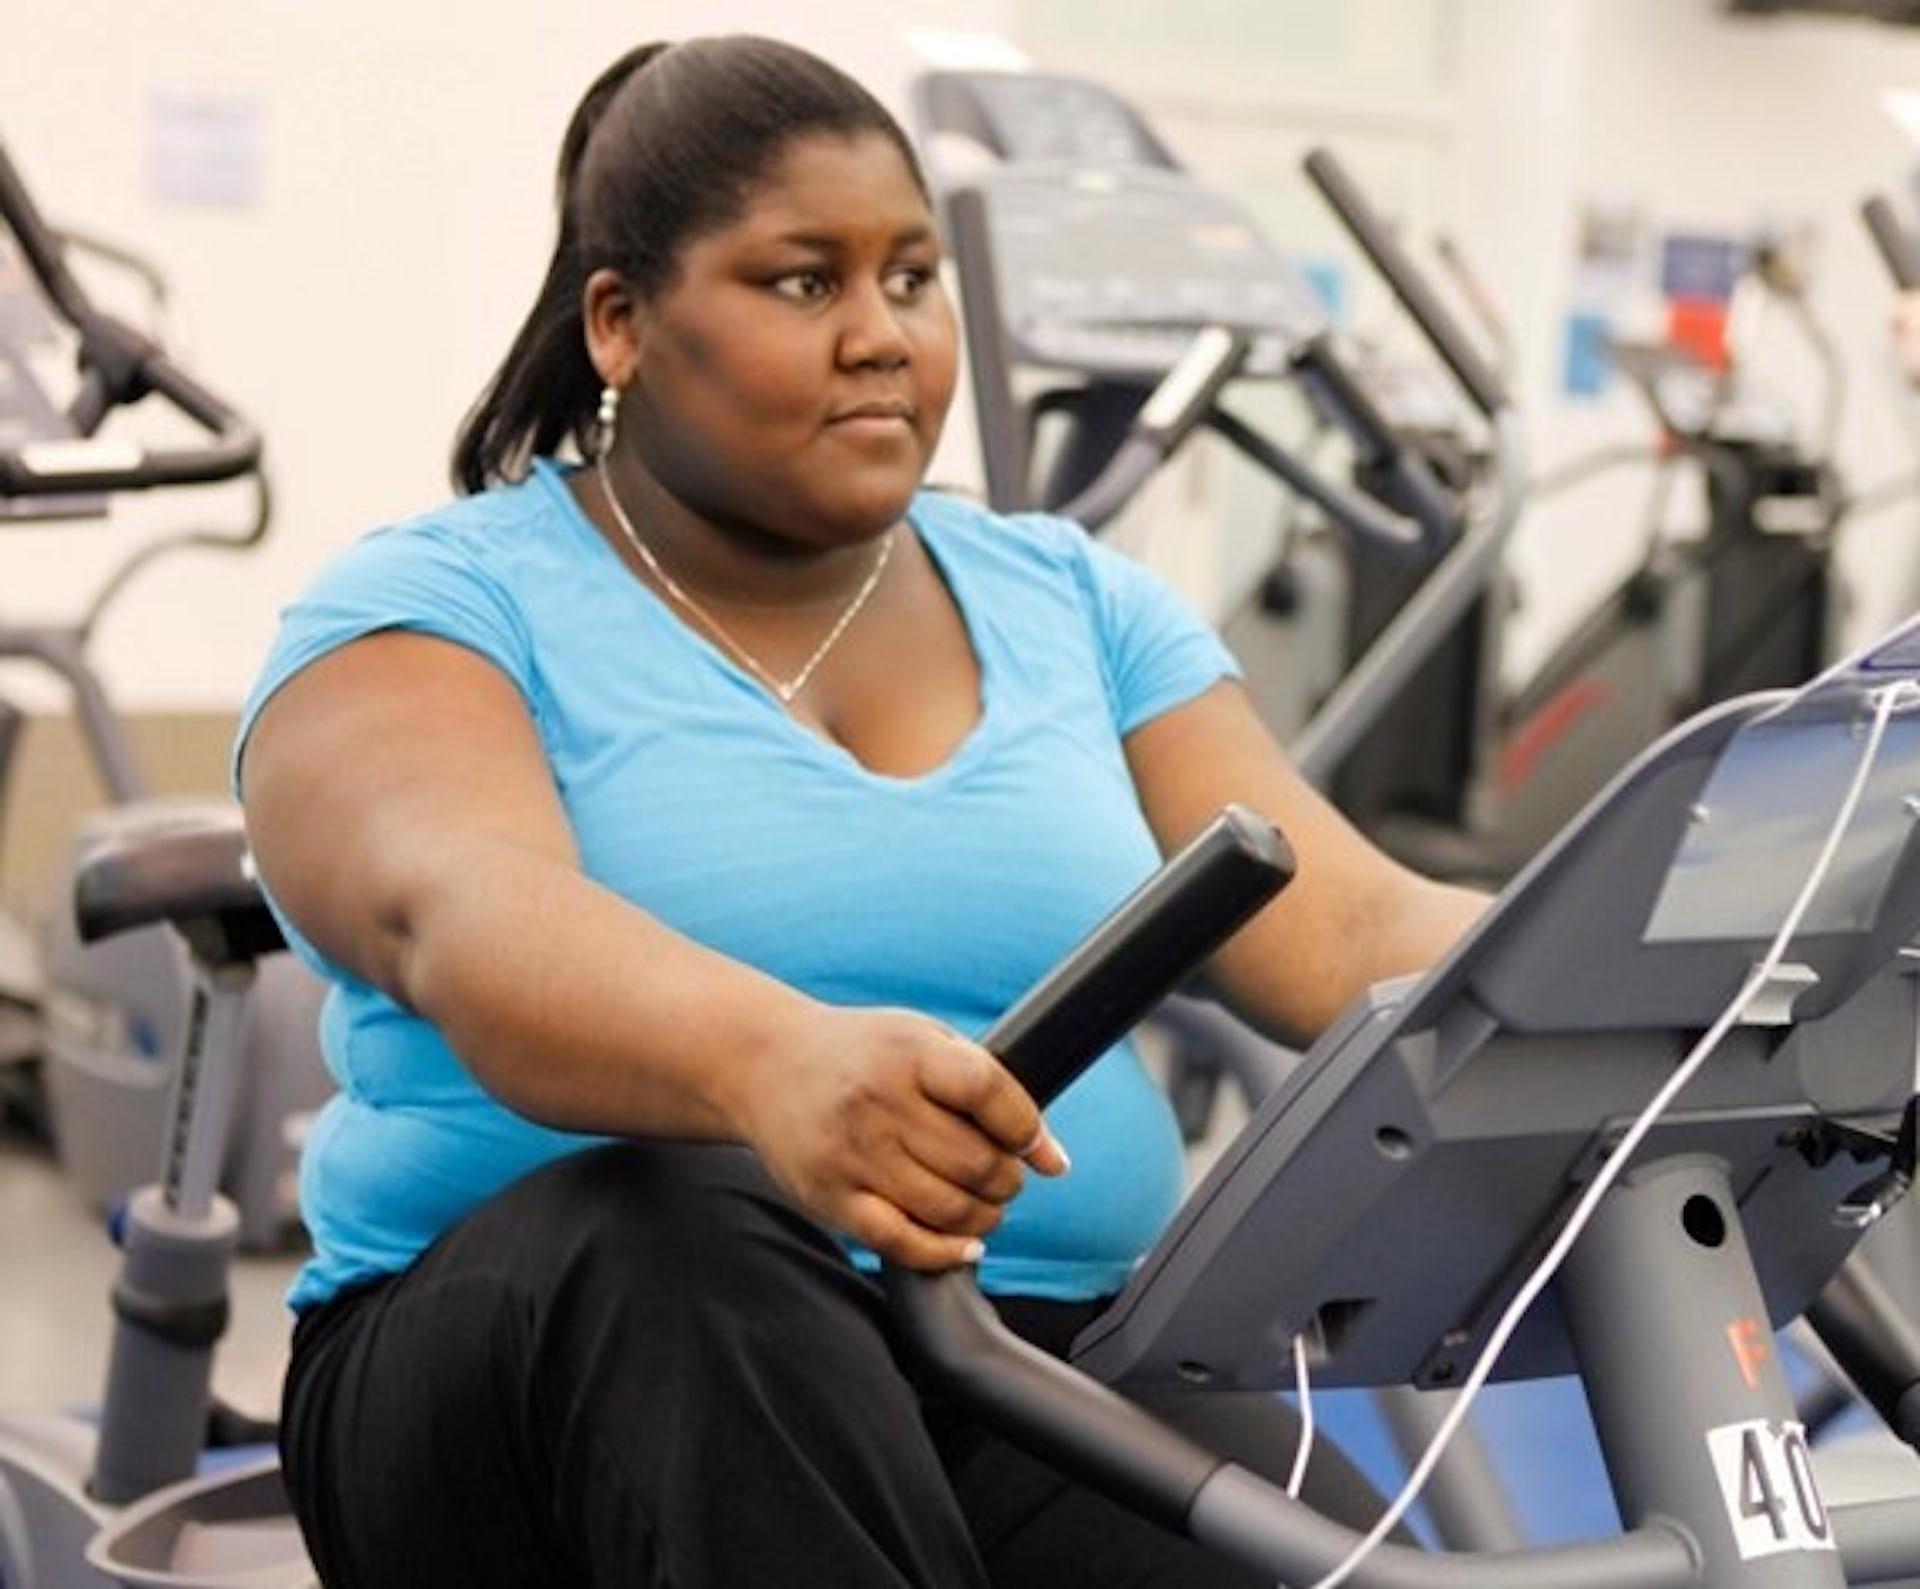 Why men like chubby women